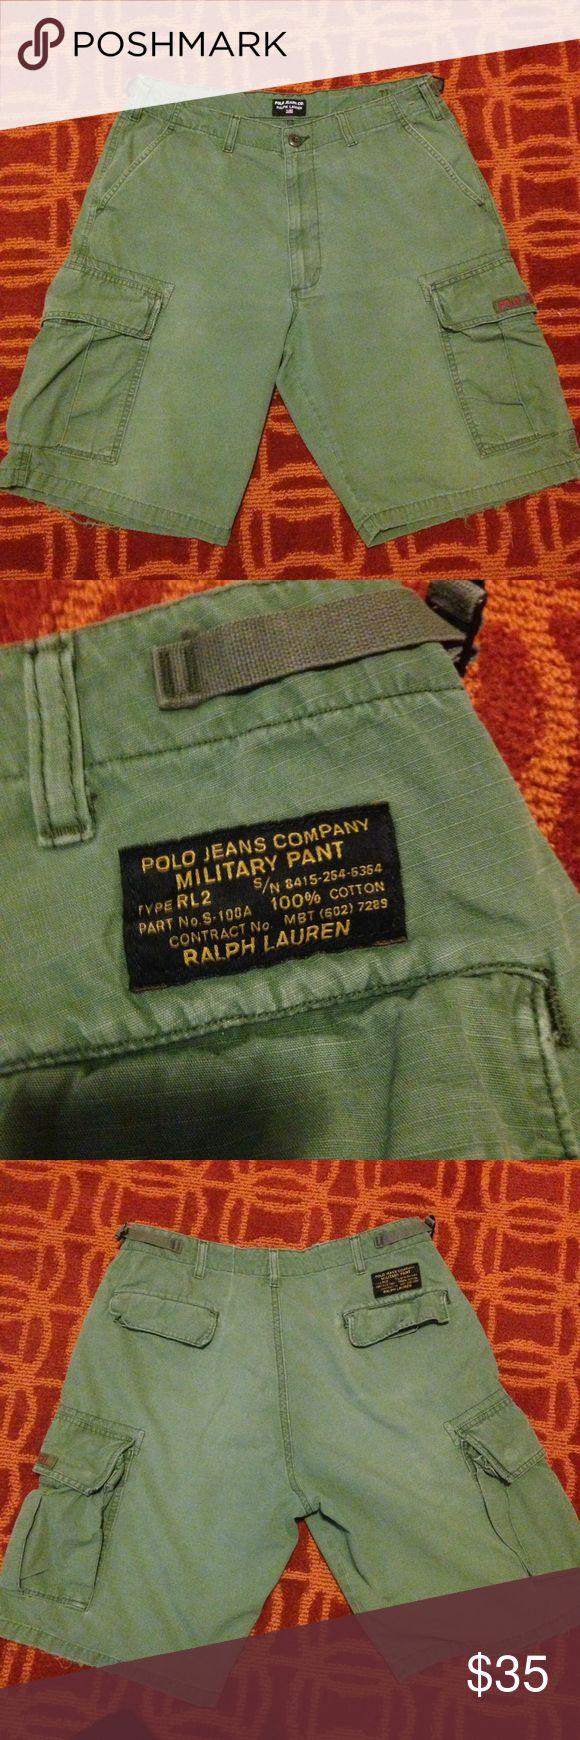 Vintage Polo Jean Company Military Pant Green forest  vintage Polo Jean by  Ralph Lauren Military cargo short....9/10 condition Polo by Ralph Lauren Shorts Cargo